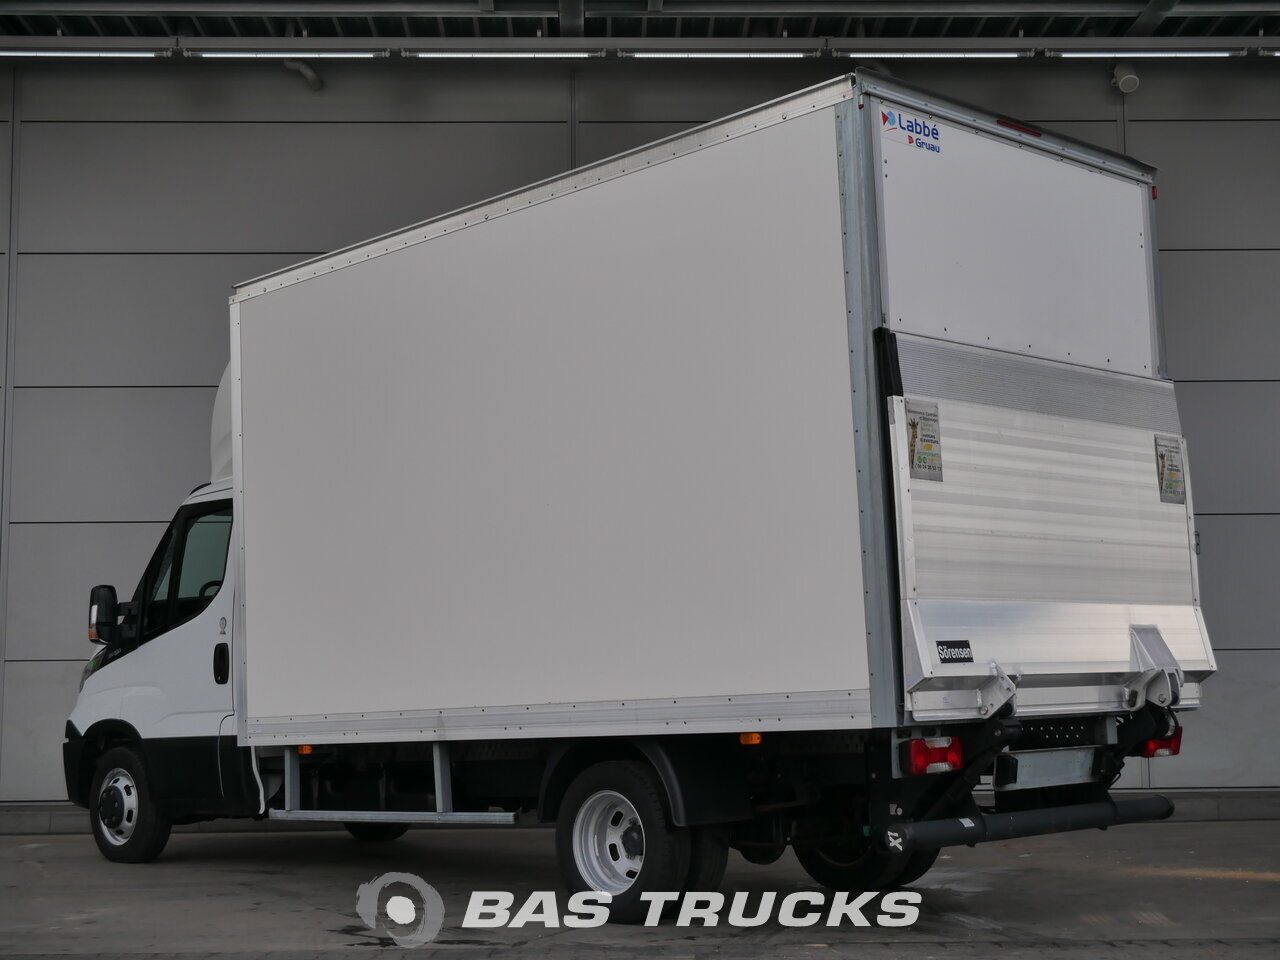 iveco daily leichte nutzfahrzeuge 0 25900bas trucks. Black Bedroom Furniture Sets. Home Design Ideas